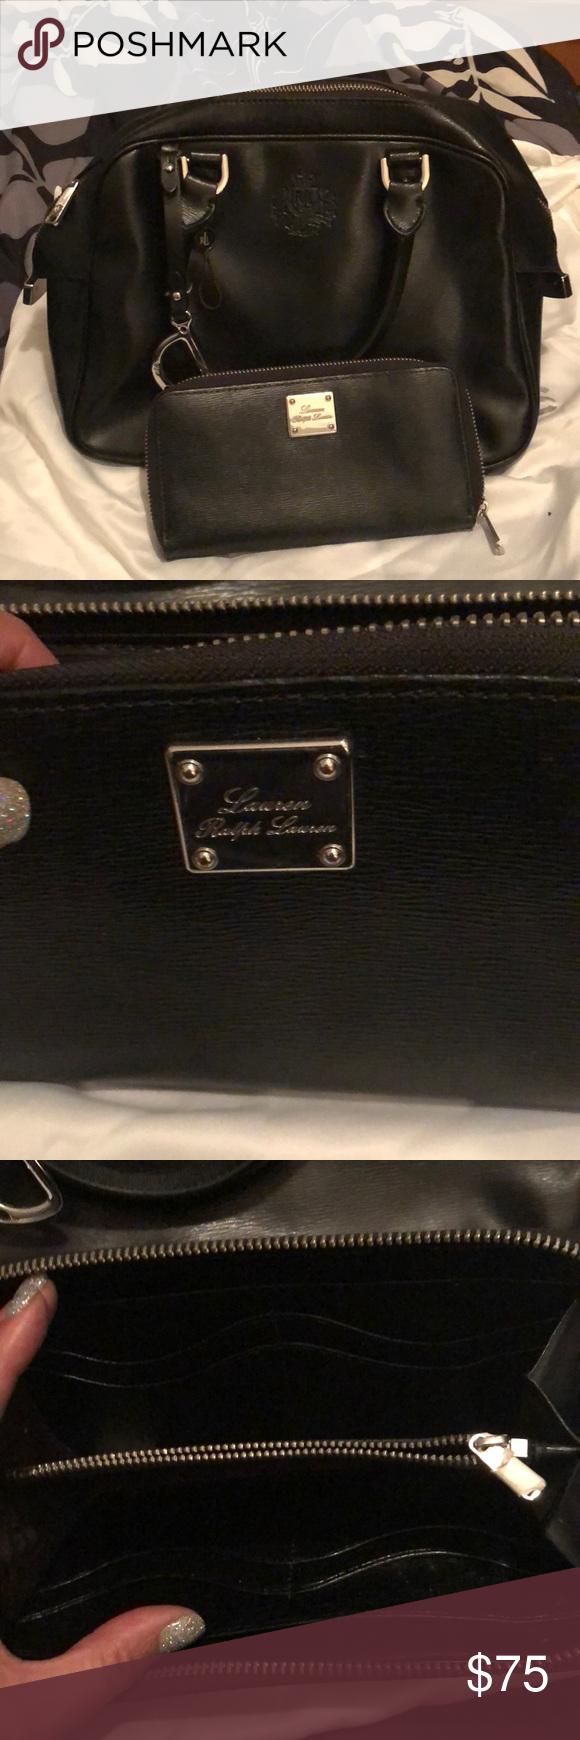 Ralph lauren bag wallet and business card holder ralph lauren ralph lauren bag wallet and business card holder reheart Images